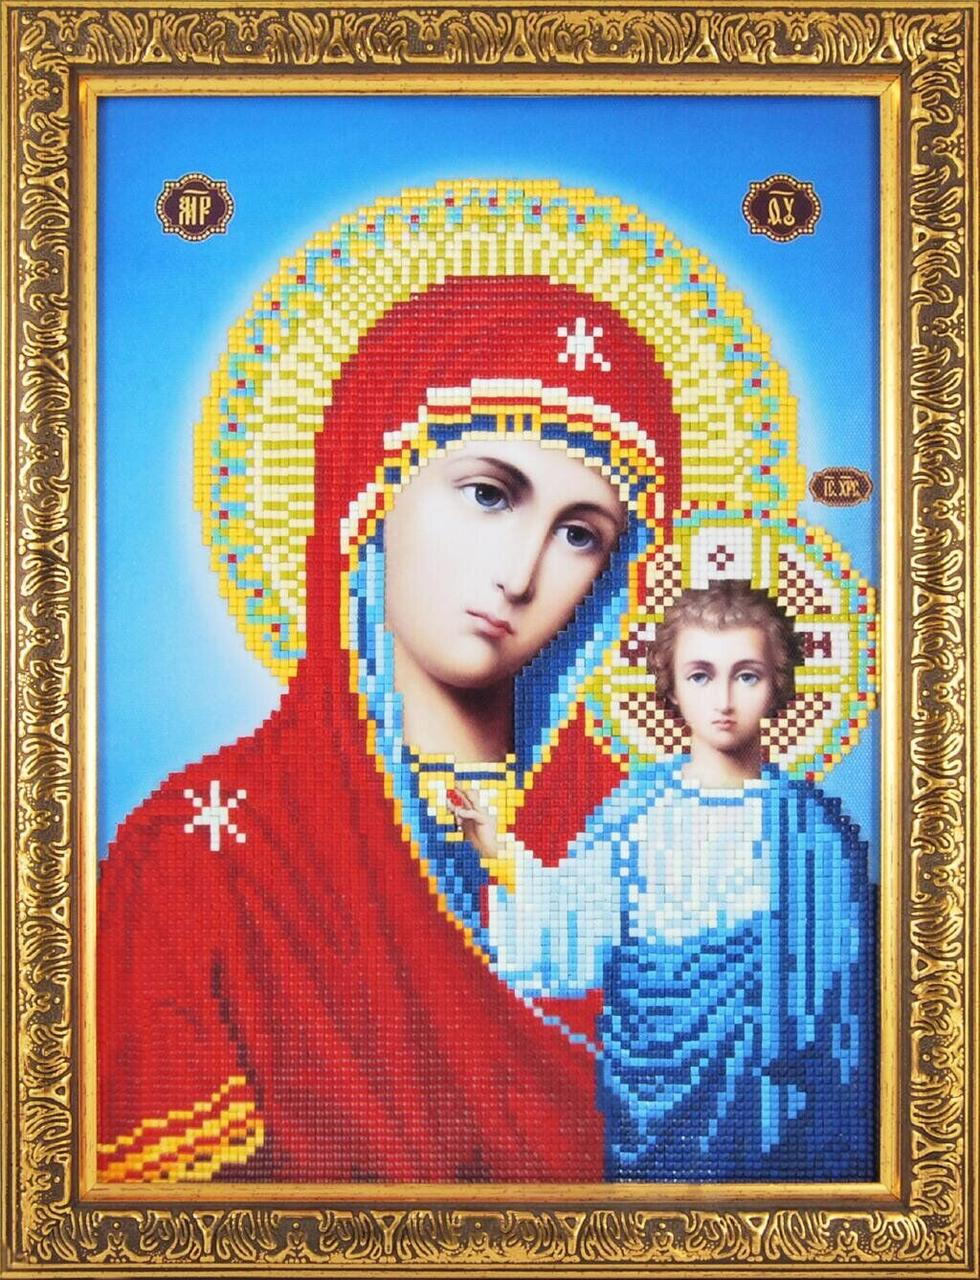 40005 Набір алмазної мозаїки Казанська Божа Матір